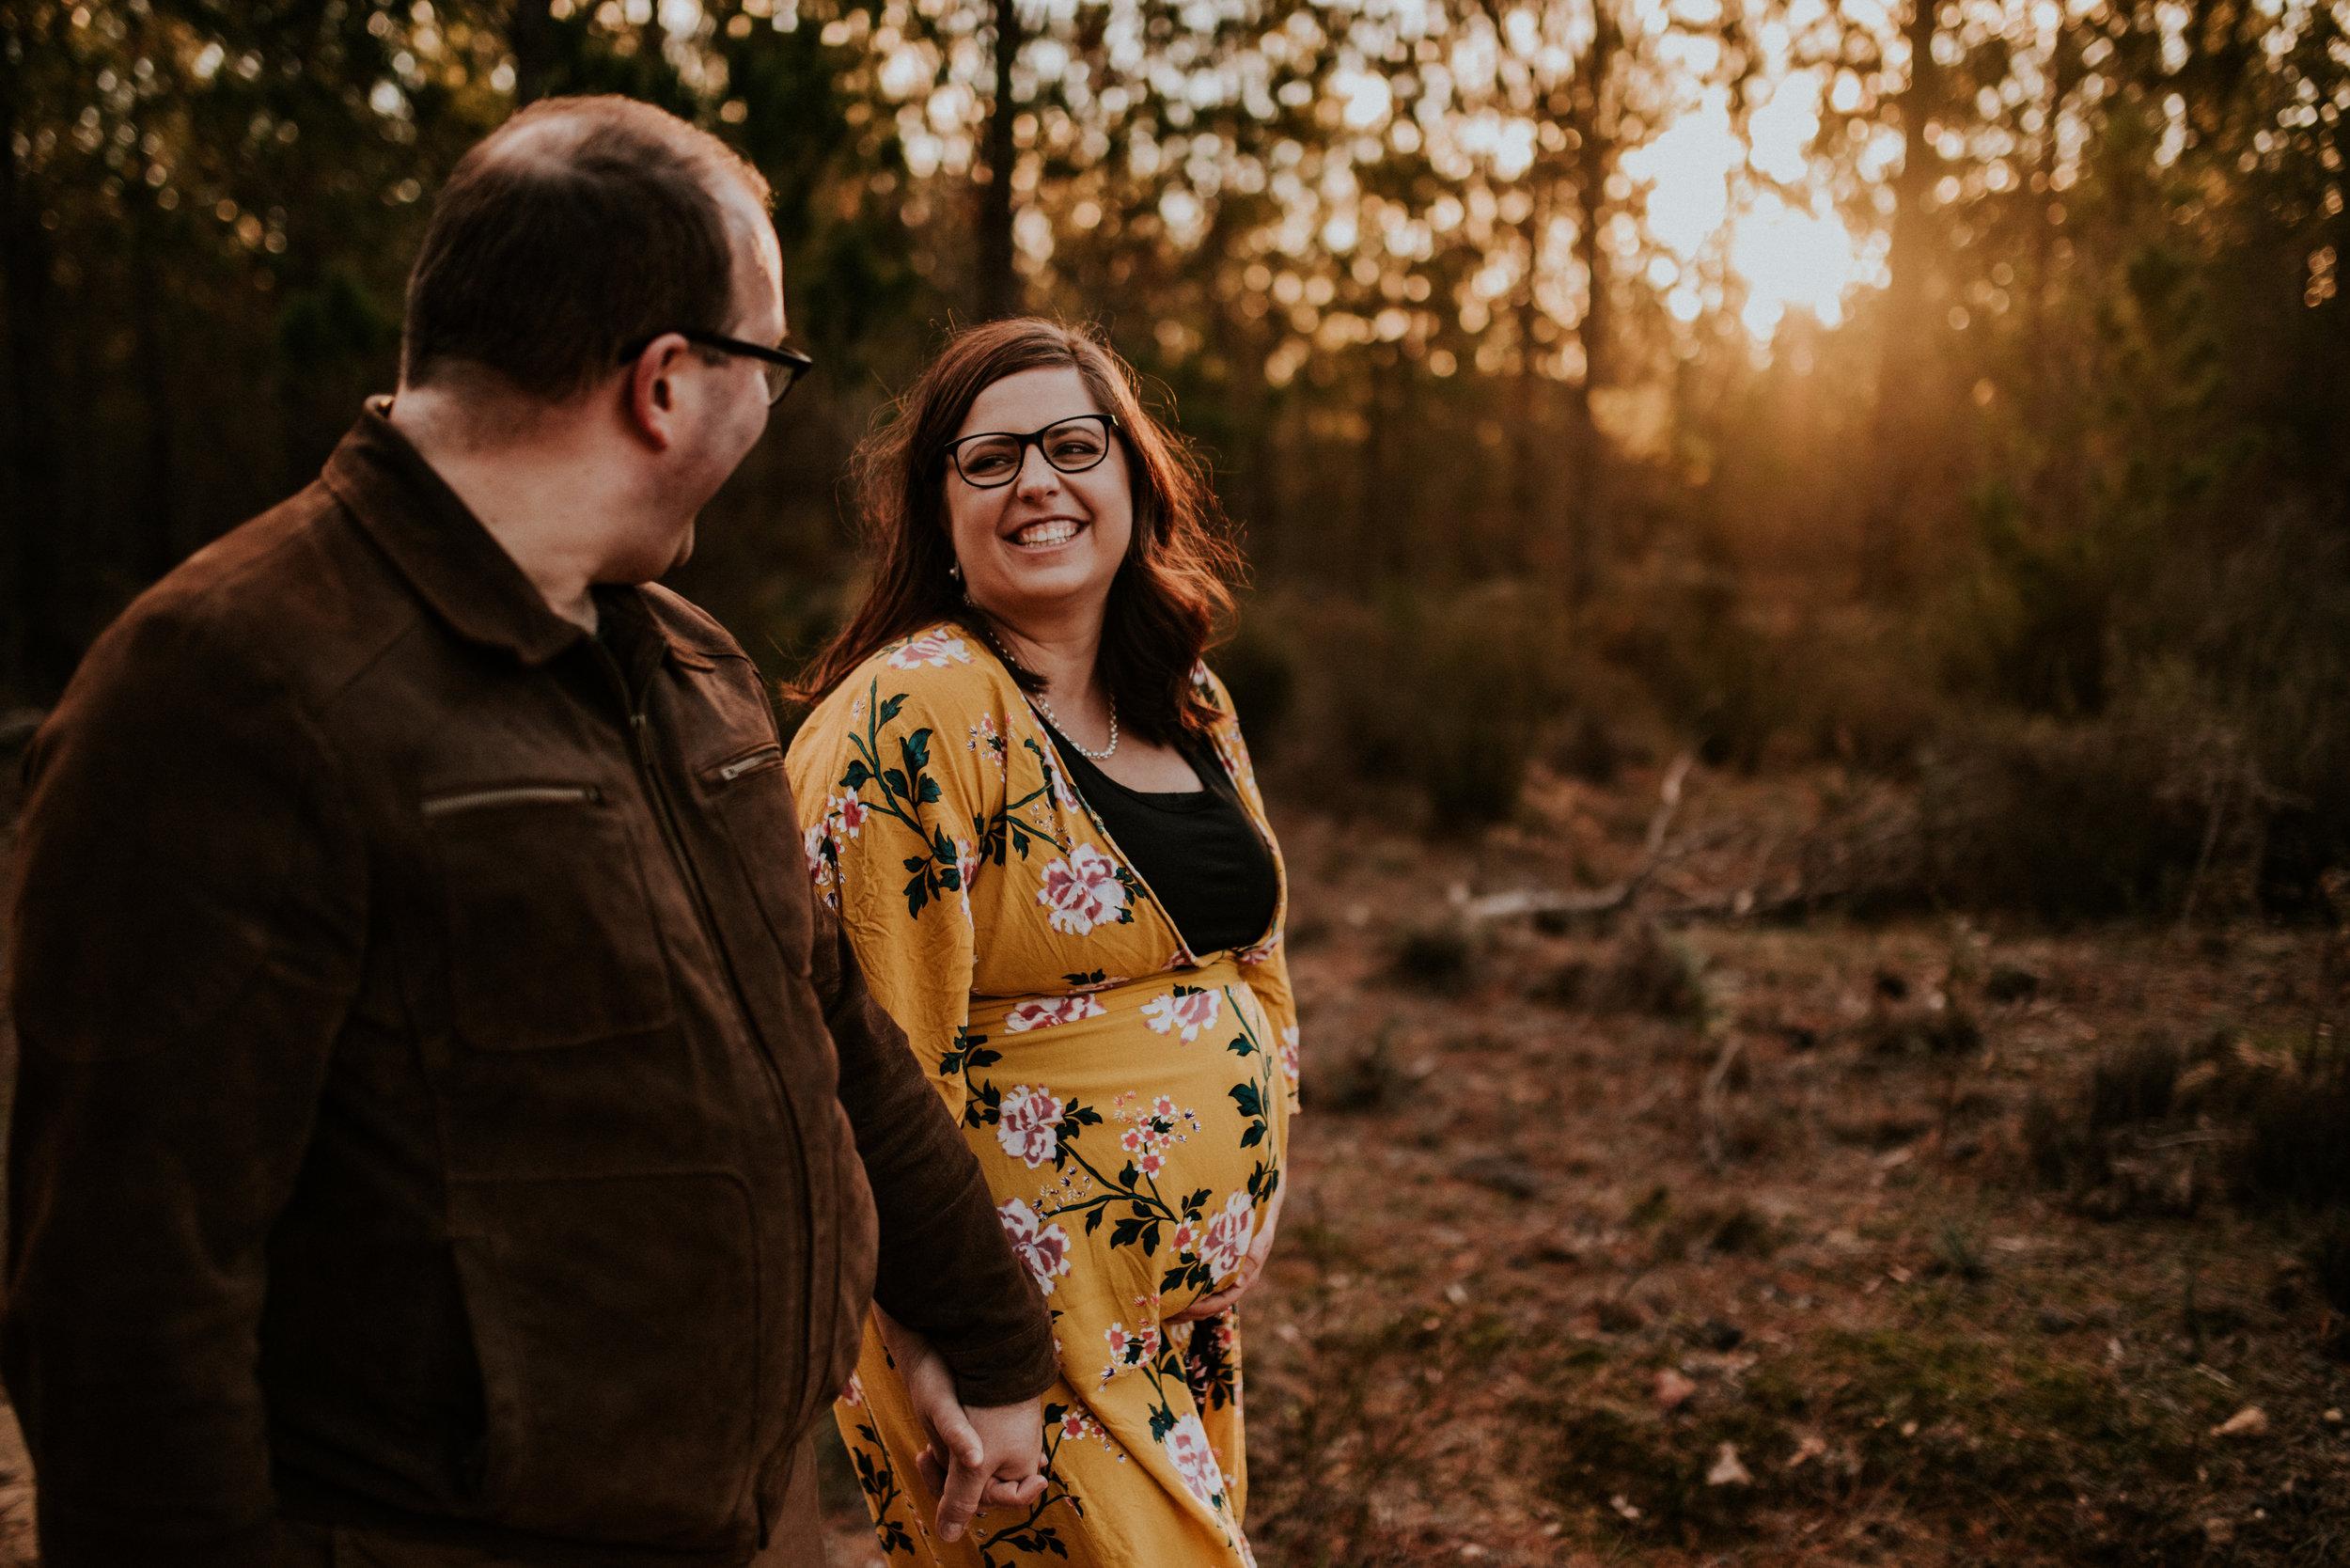 Kat & David - Southern Highlands Maternity     29th July 2018